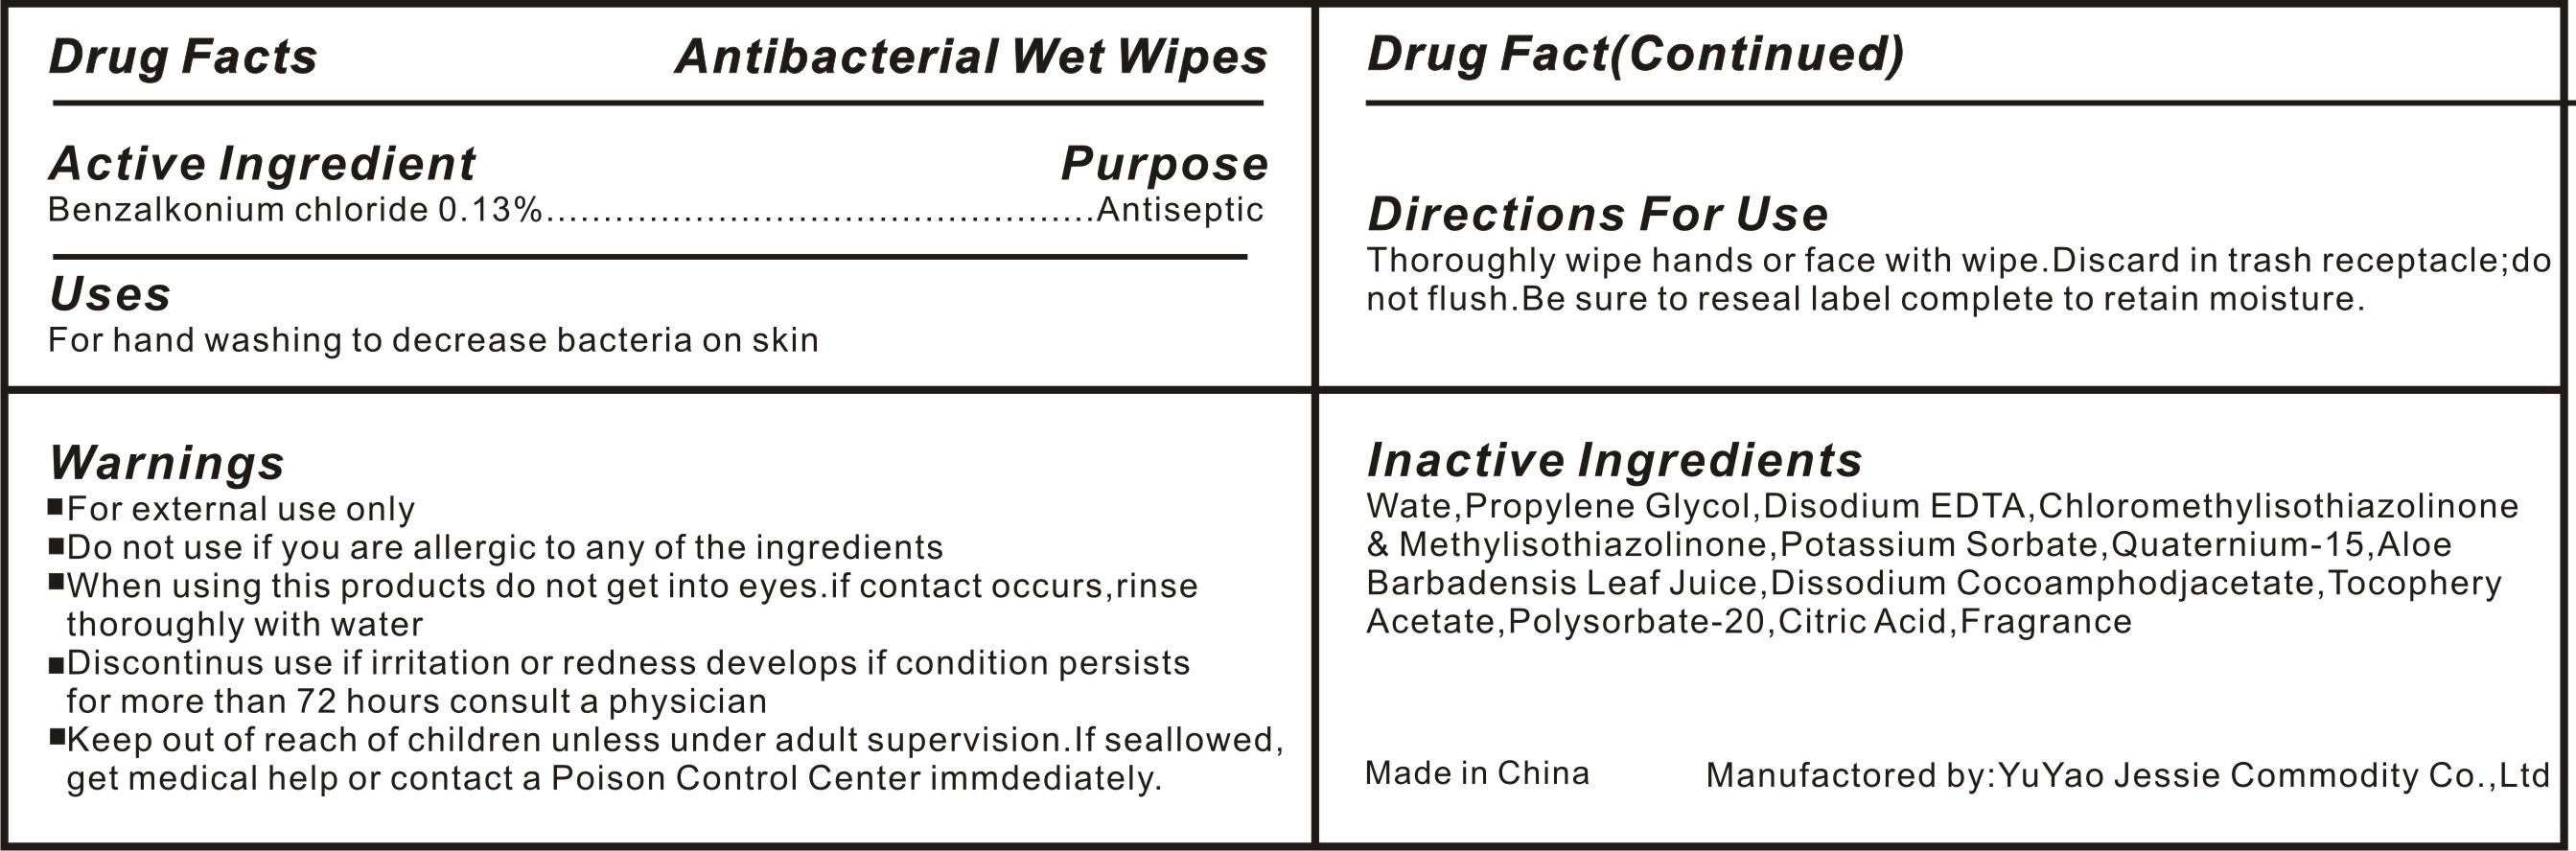 Antibacterial Wet Wipes (Benzalkonium Chloride) Swab [Yuyao Jessie Commodity Co.,ltd.]